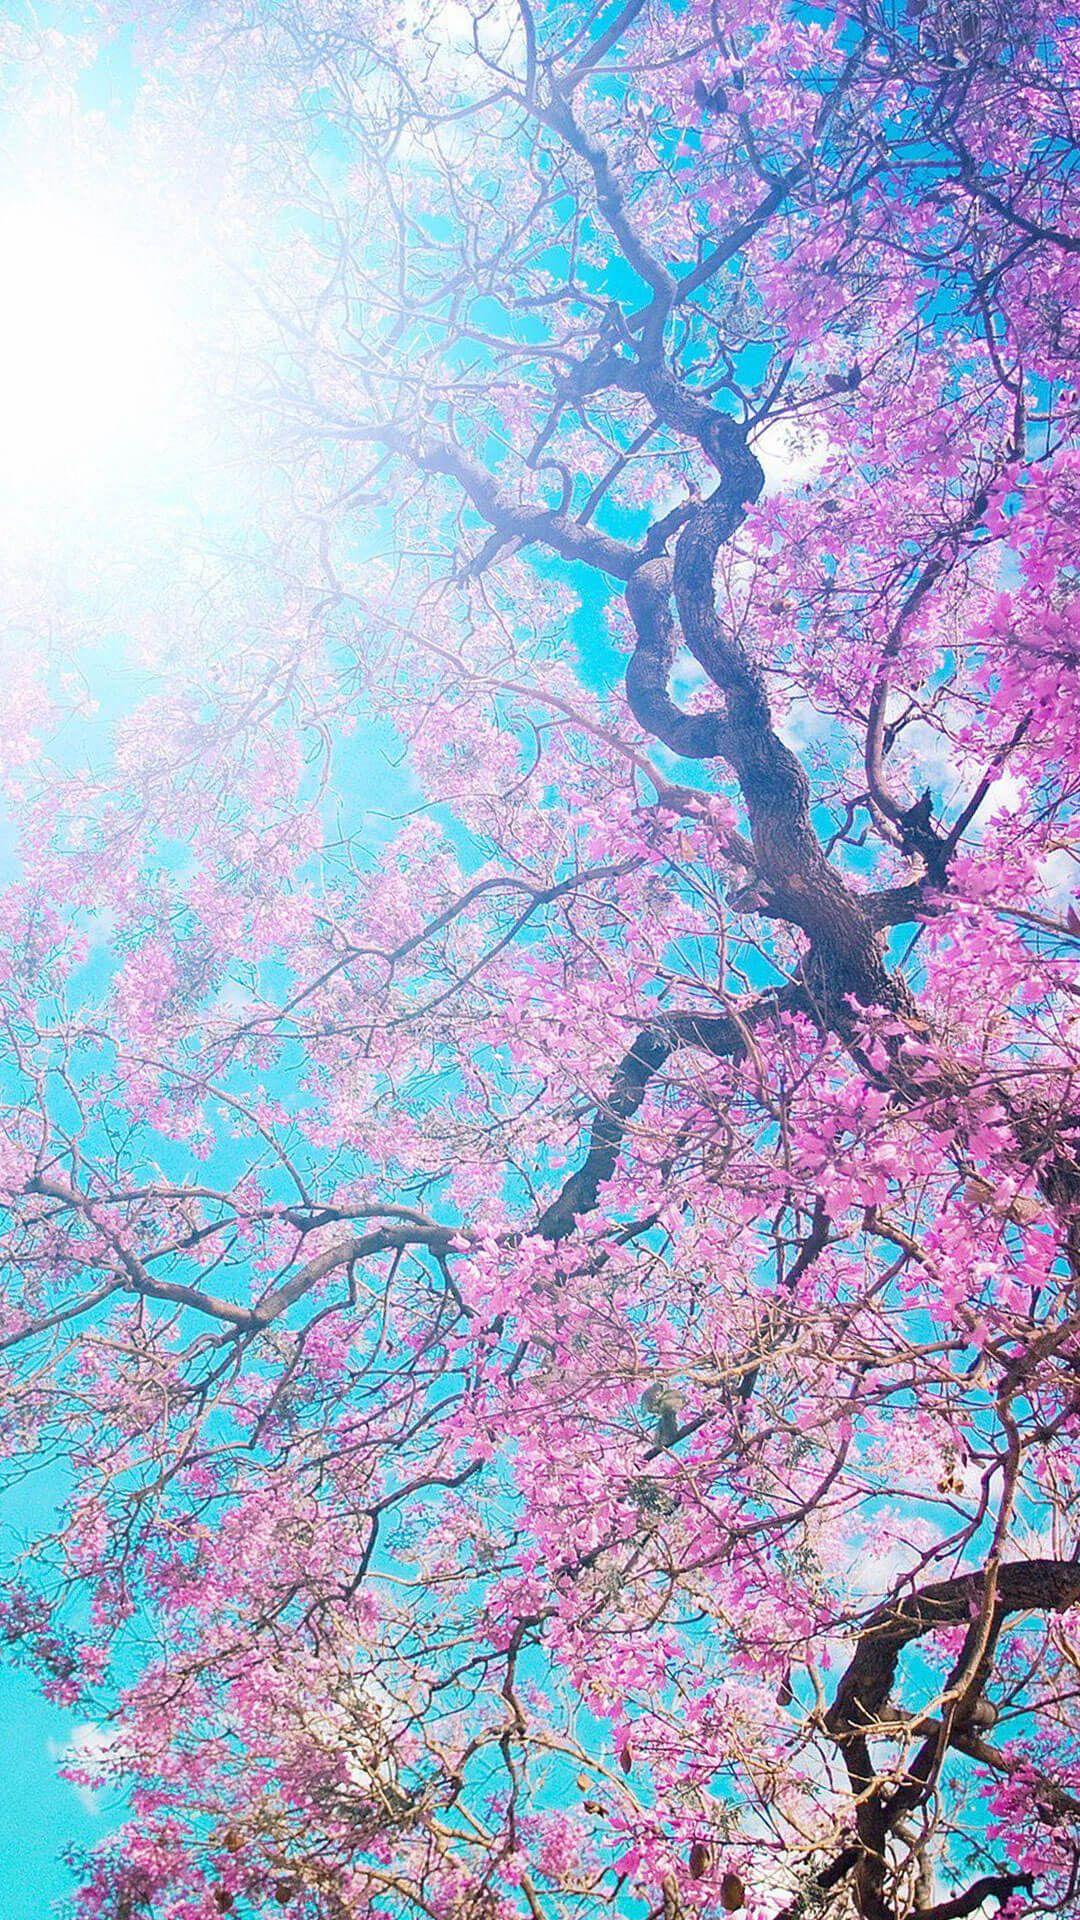 Sakura Flowers Wallpaper Iphone 6 Hd Nature Wallpapers For Iphone